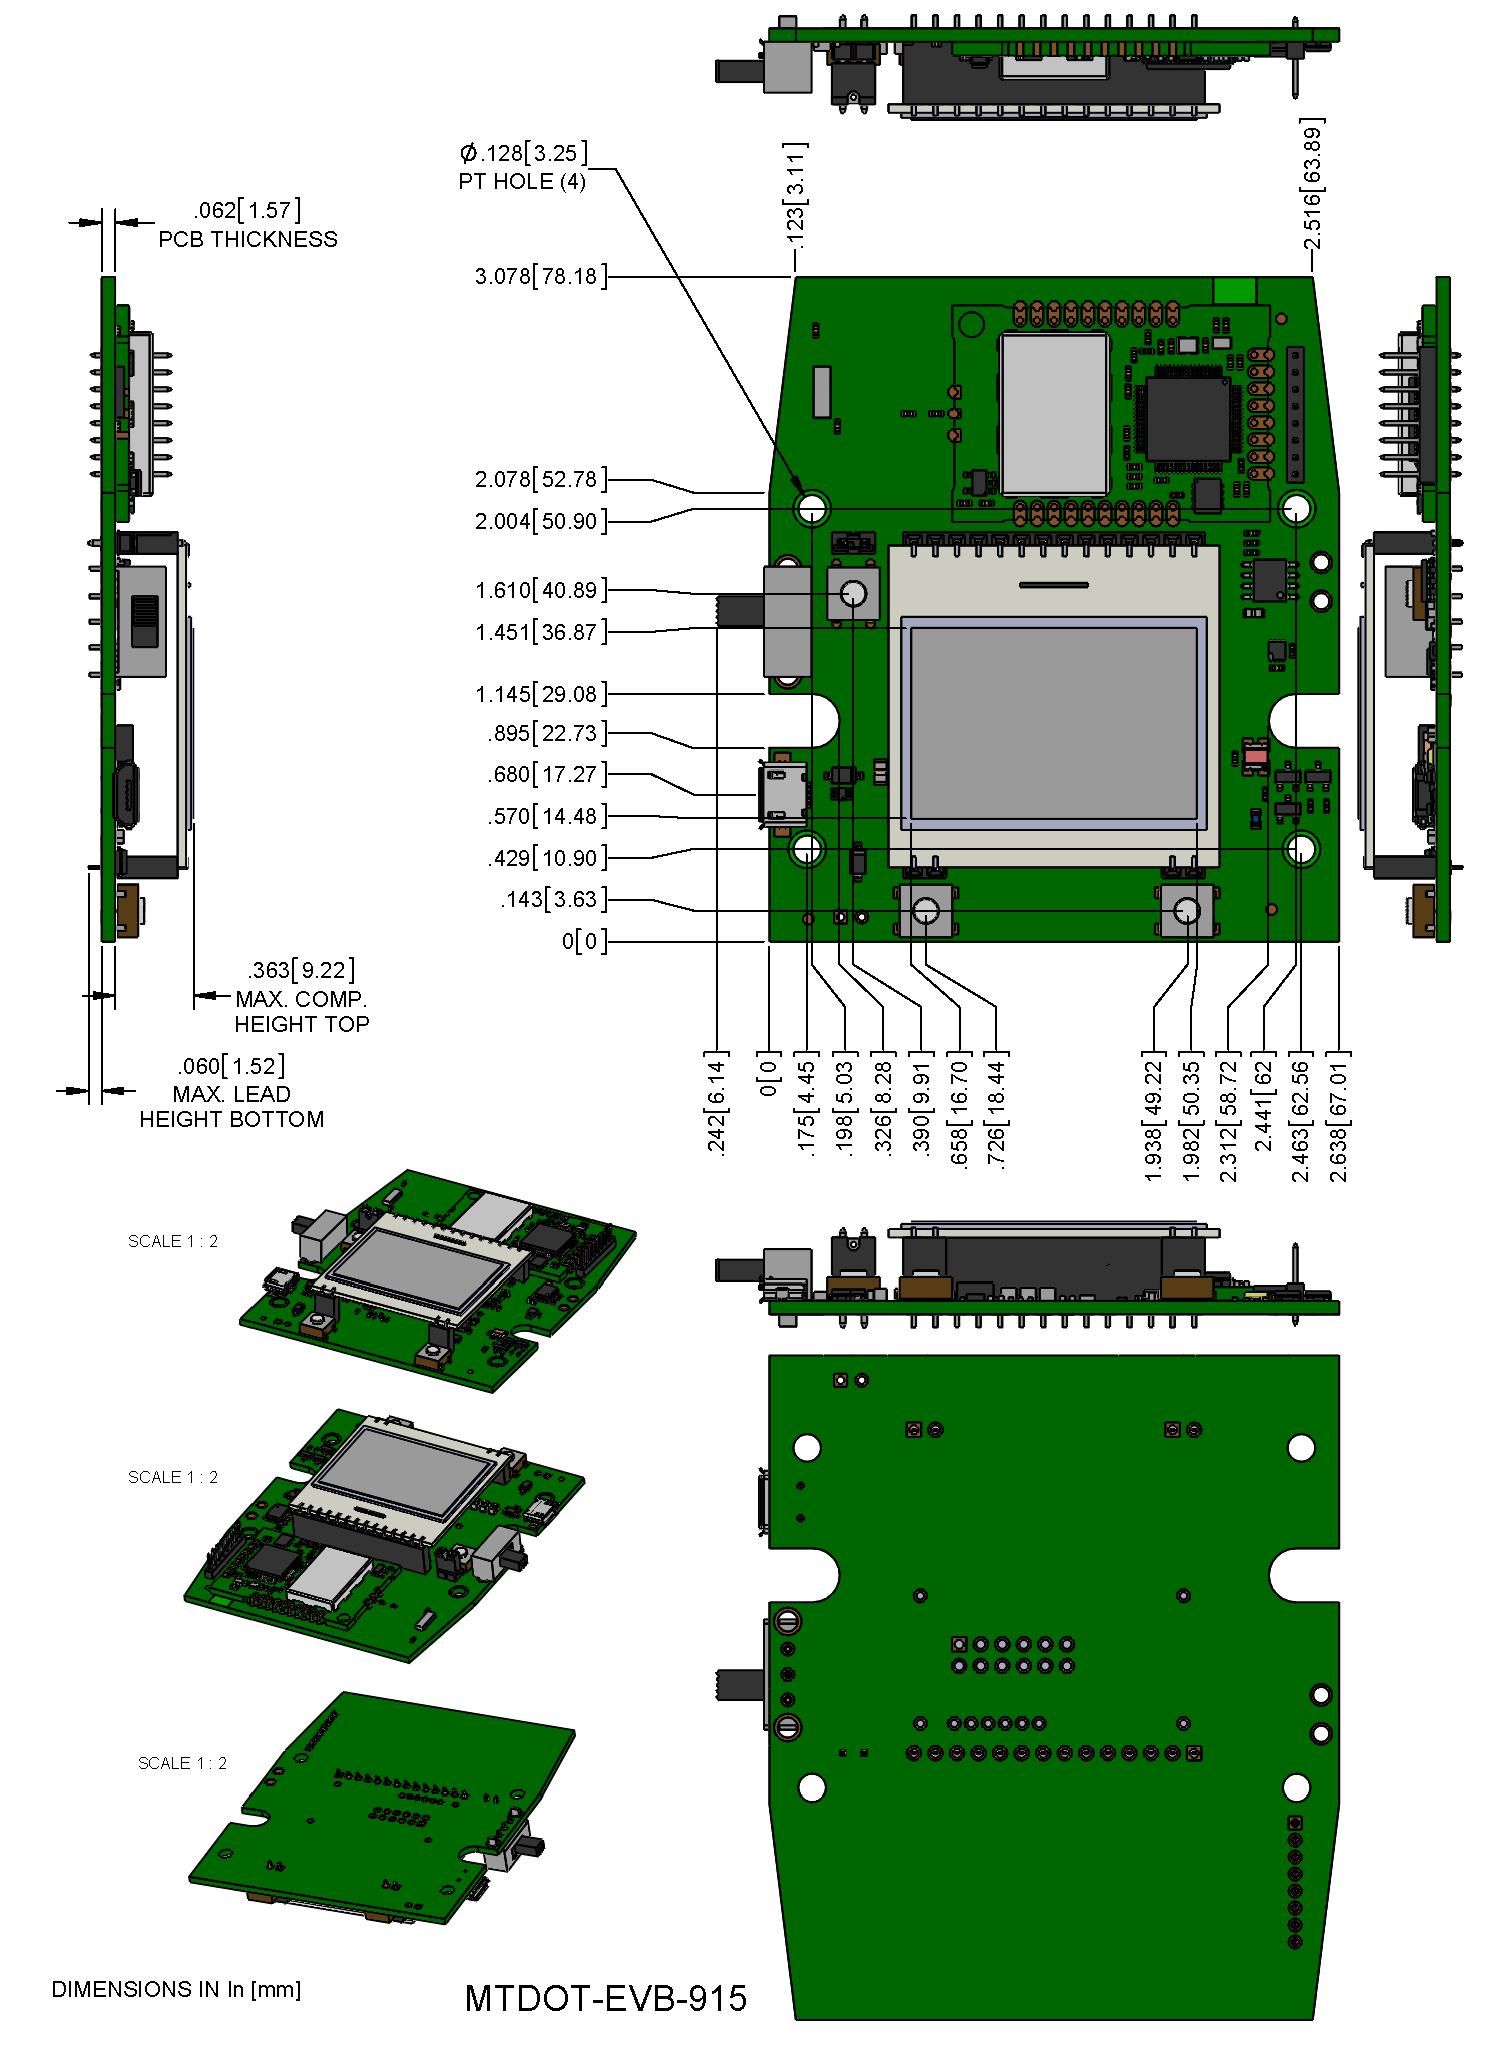 MTDOT-EVB Board Dimensions